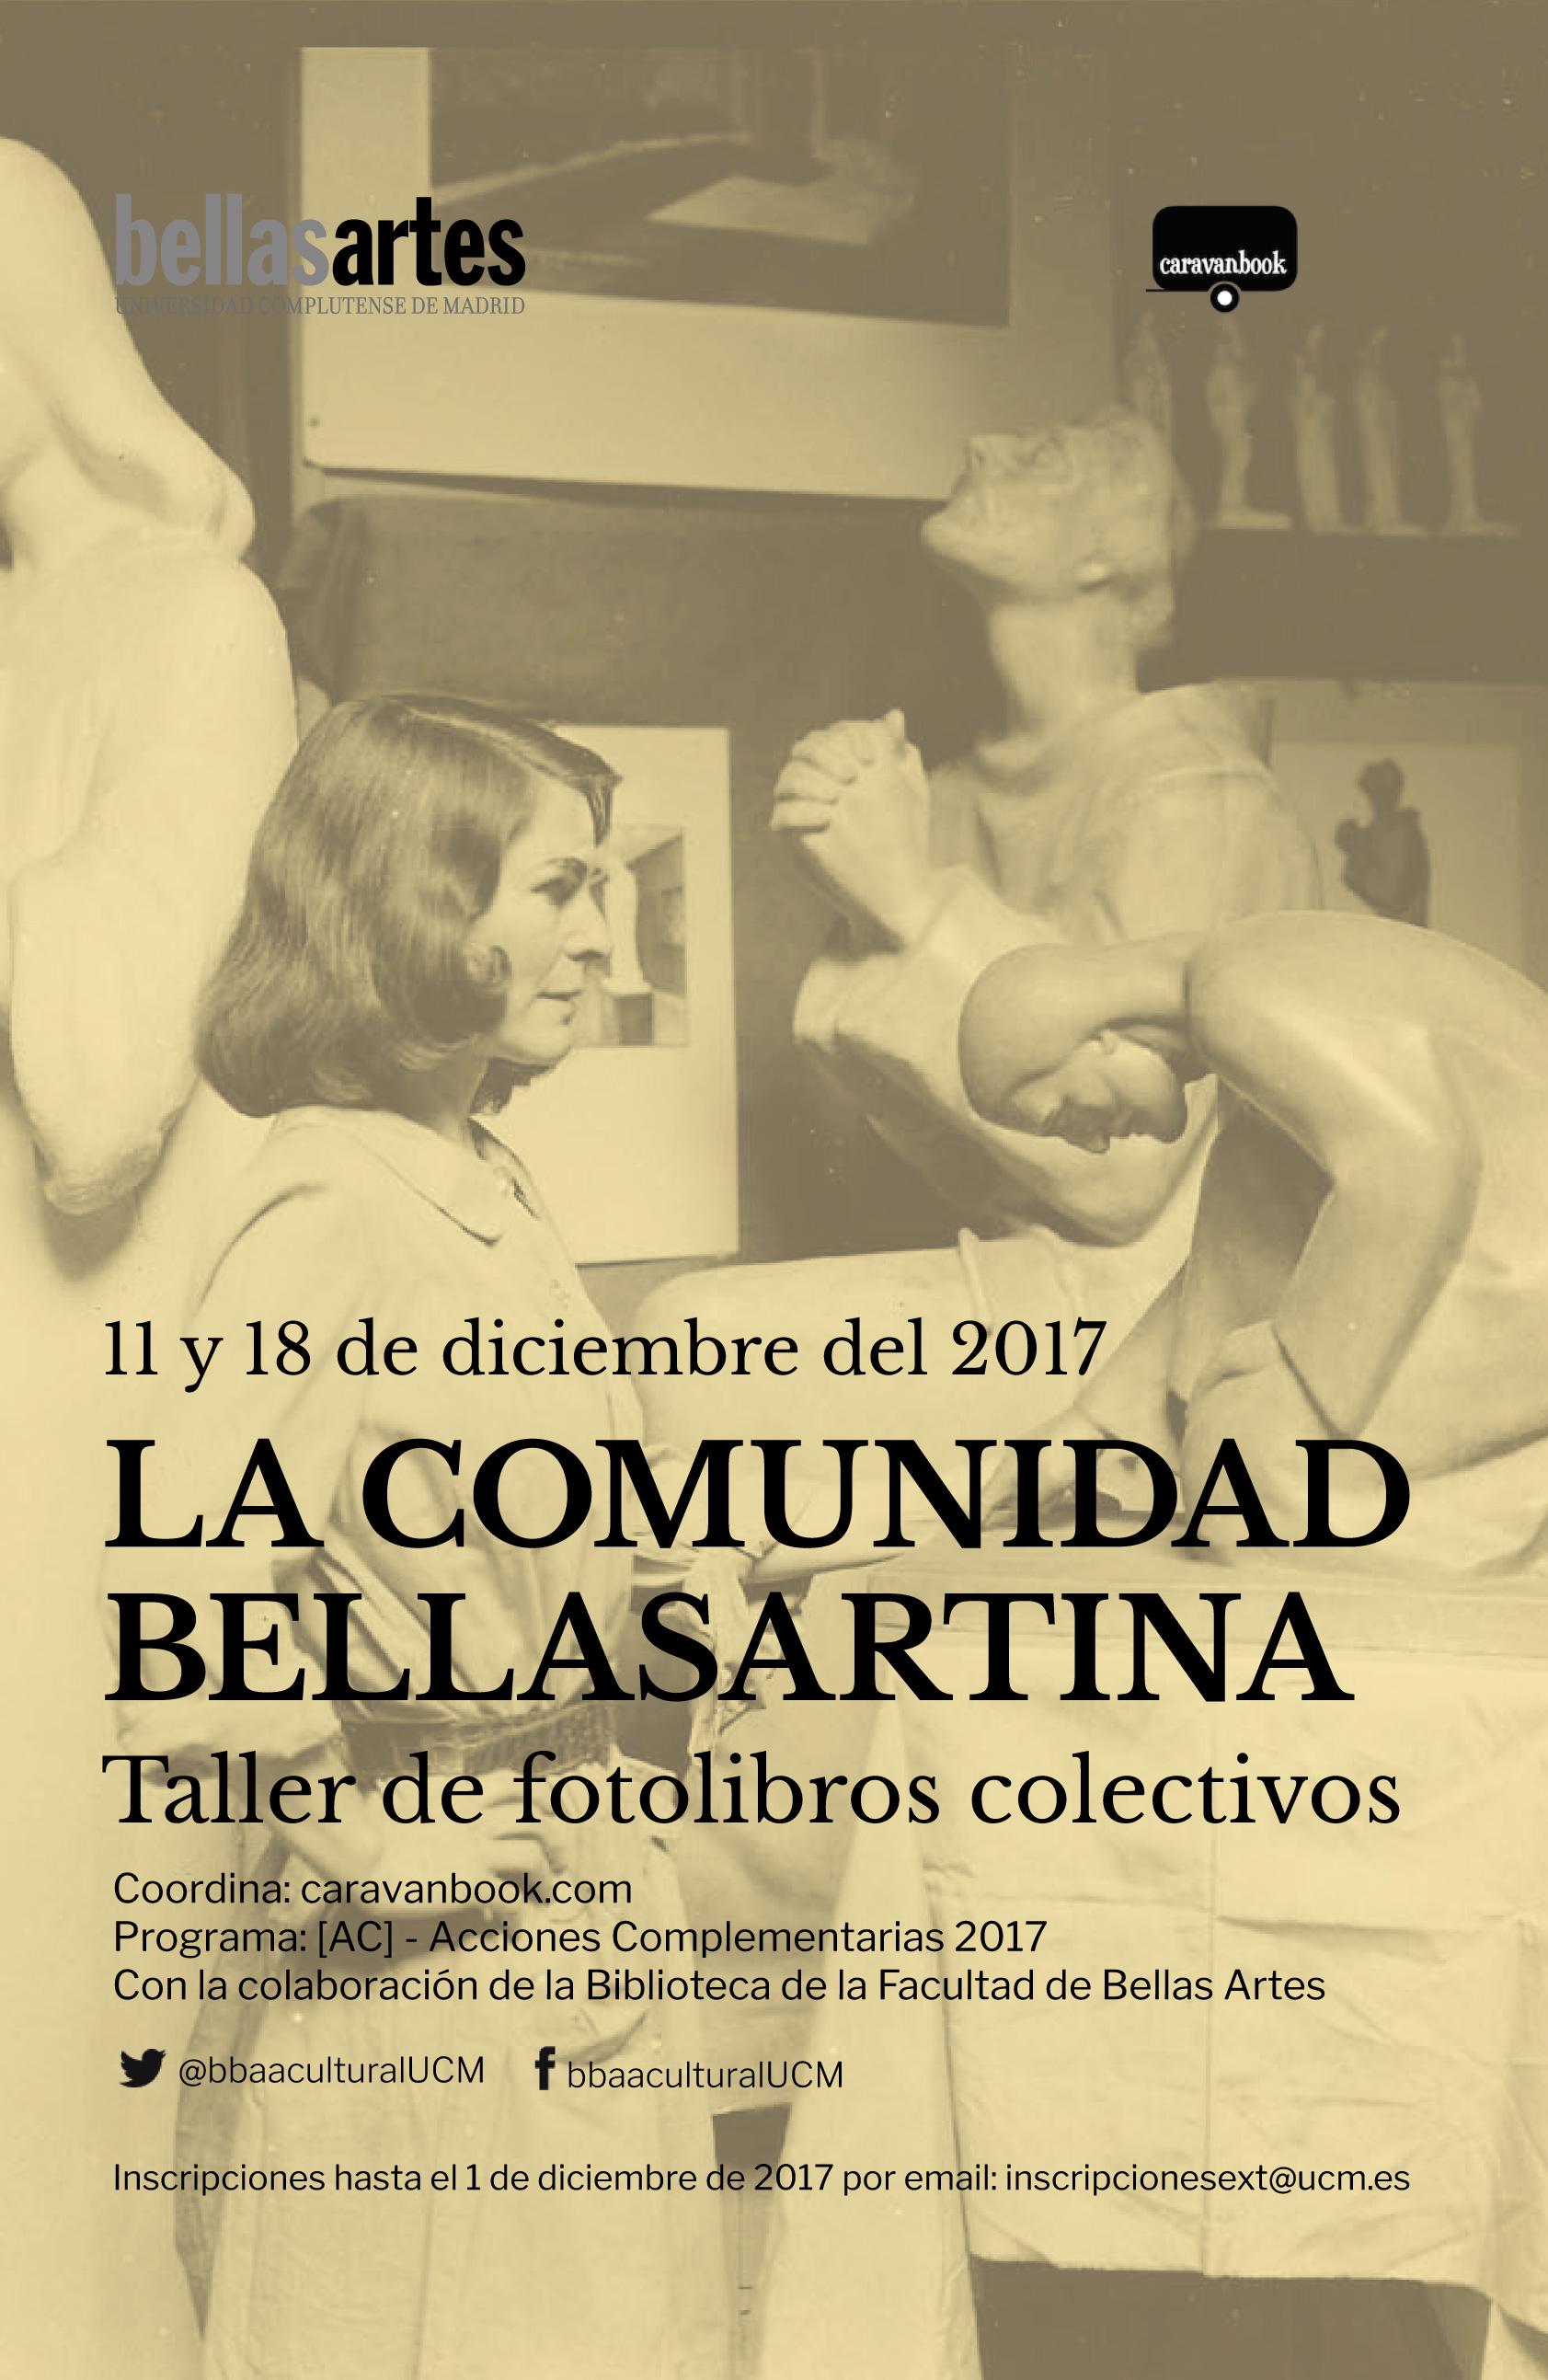 Caravanbook_cartel_tallerAccionesComplementariasUCM2017dic.jpg